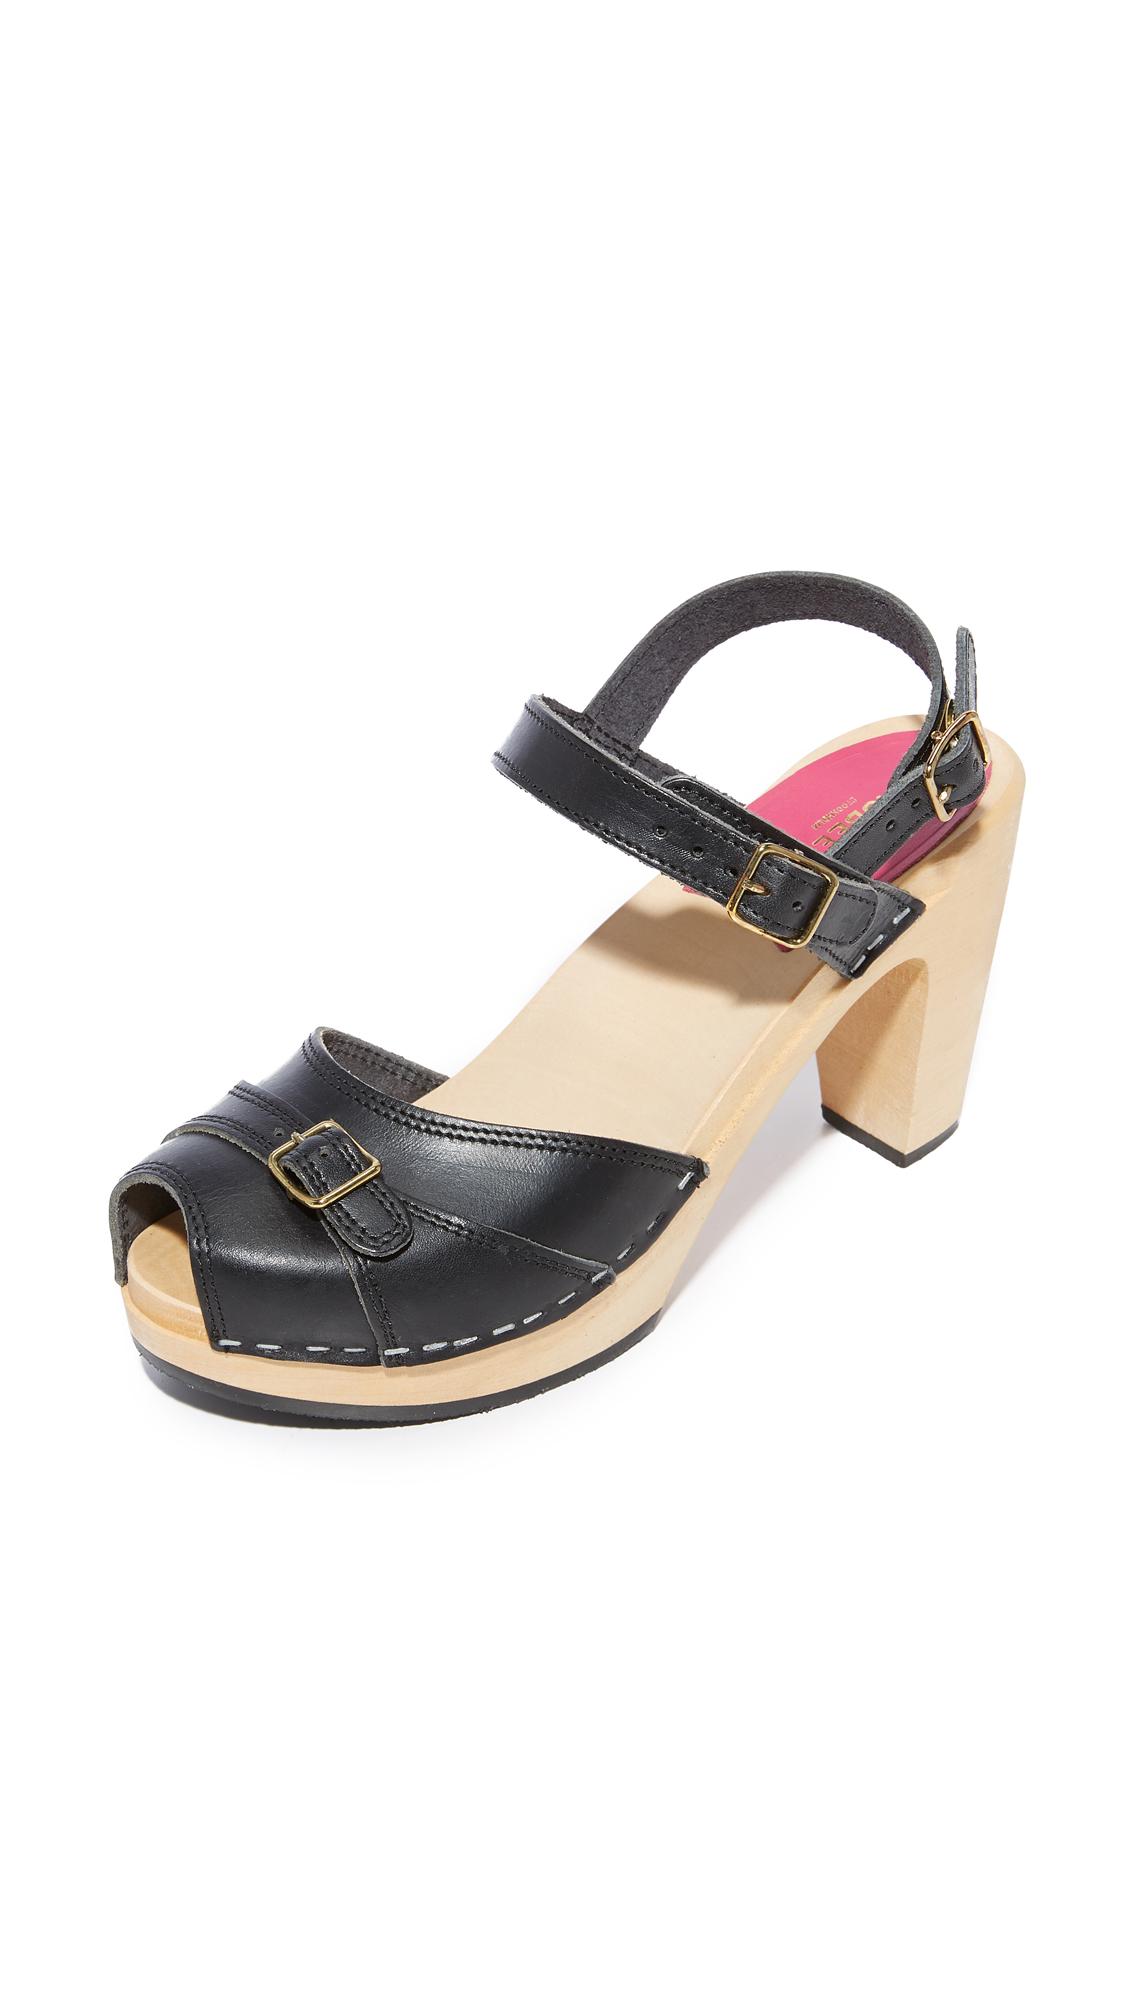 Swedish Hasbeens Preppy Sky High Sandals - Black